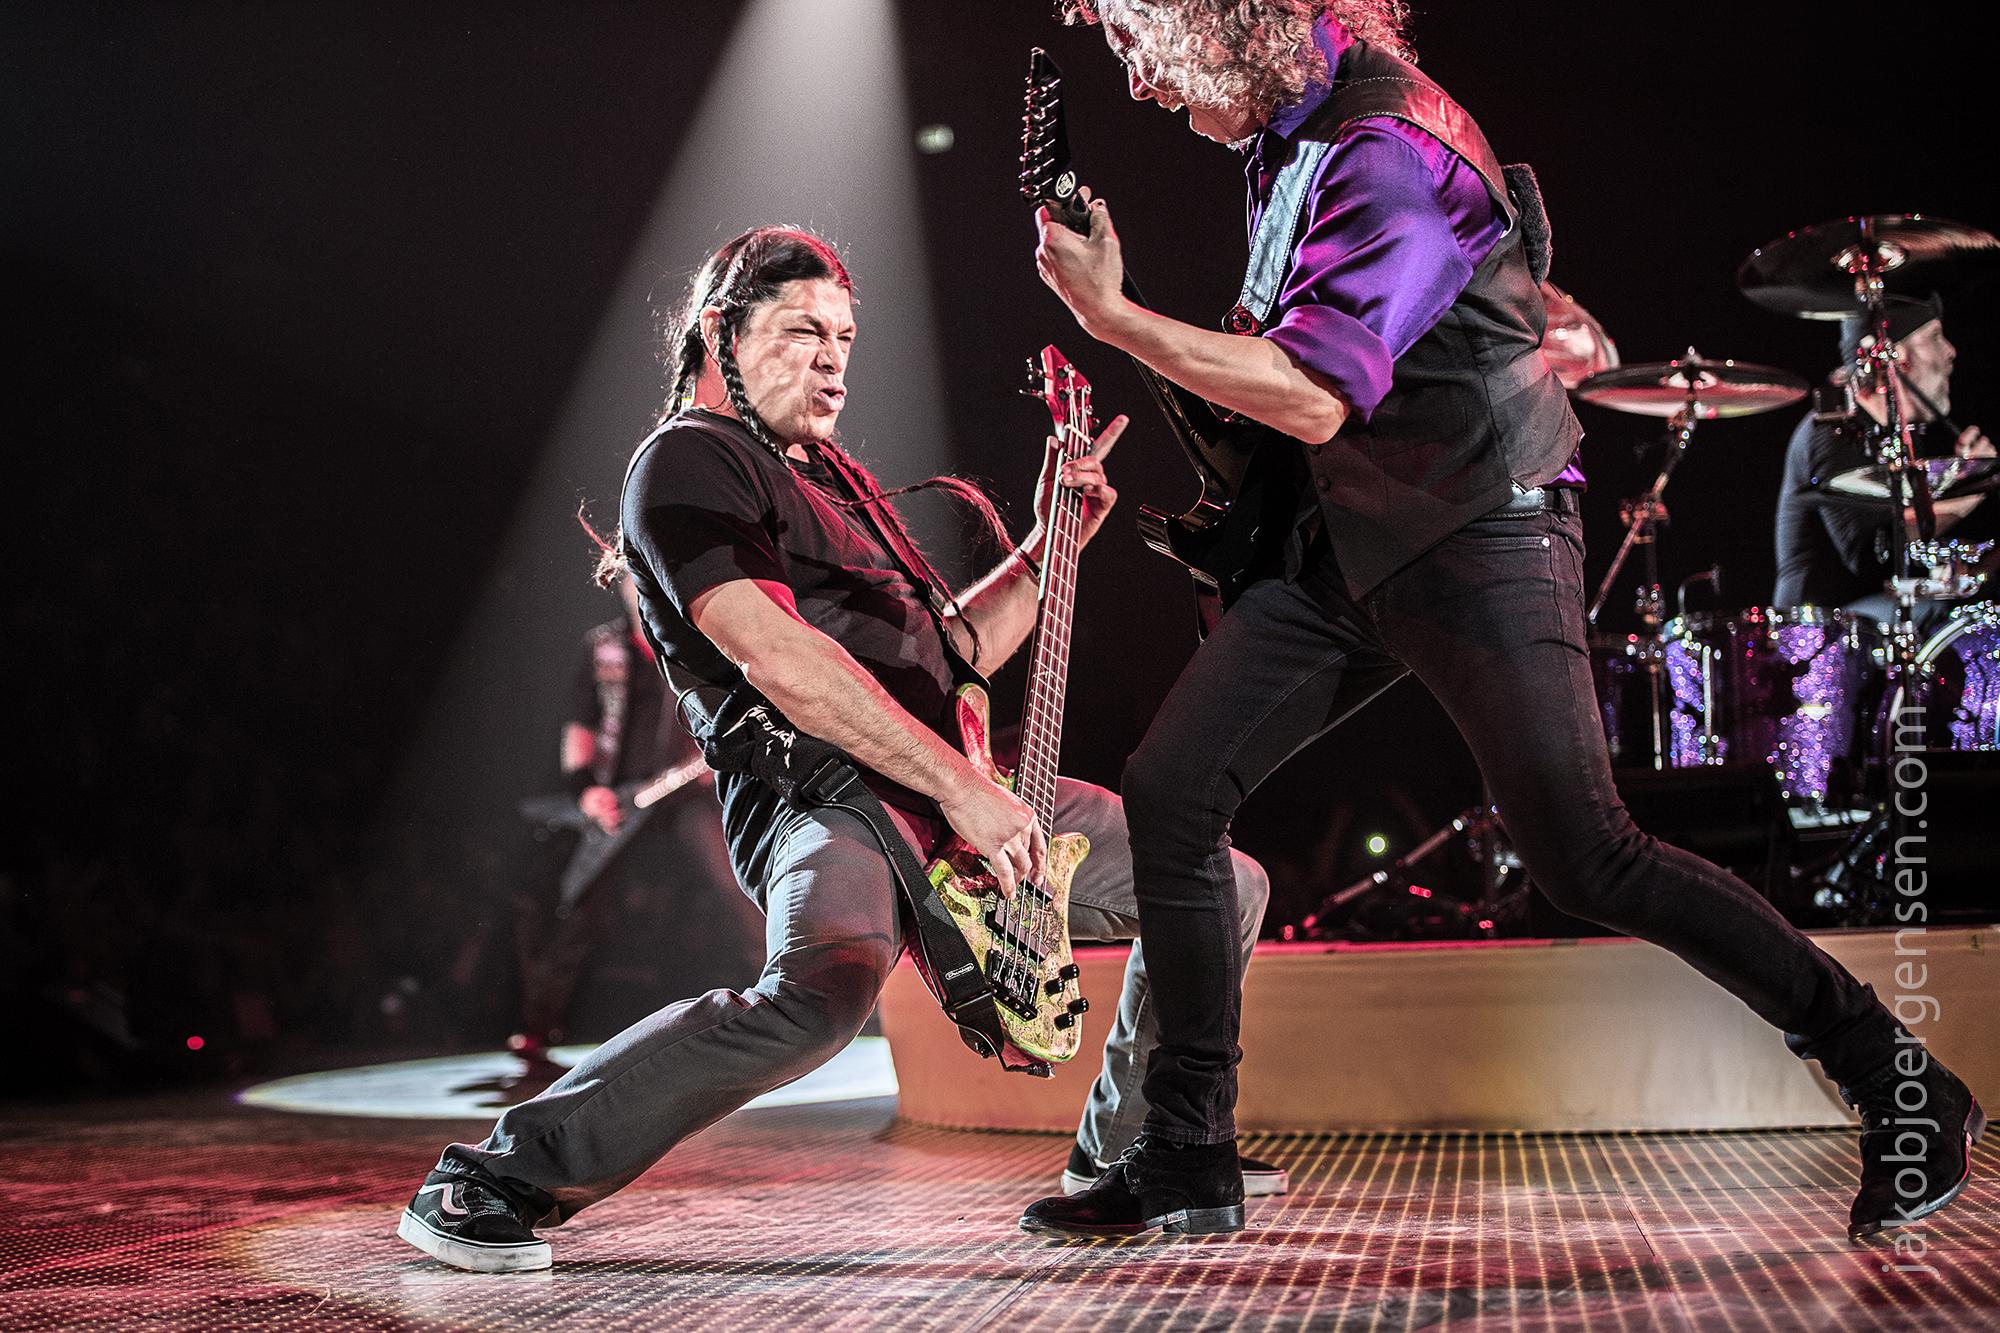 09-02-17_EB Metallica_0594.jpg